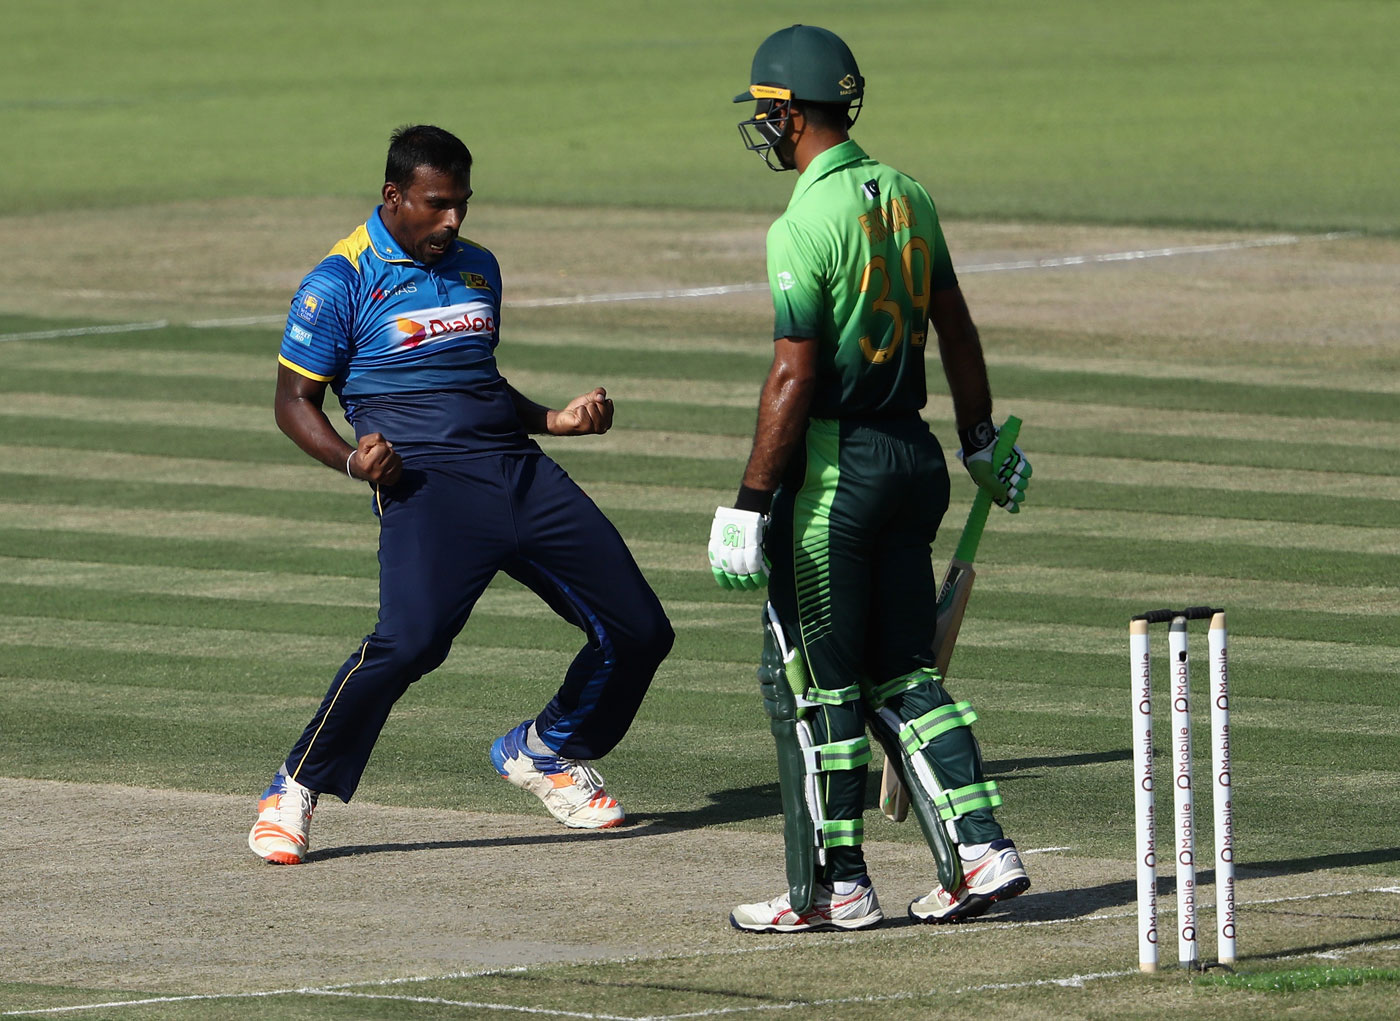 Pakistan vs Sri Lanka 2nd ODI Highlights